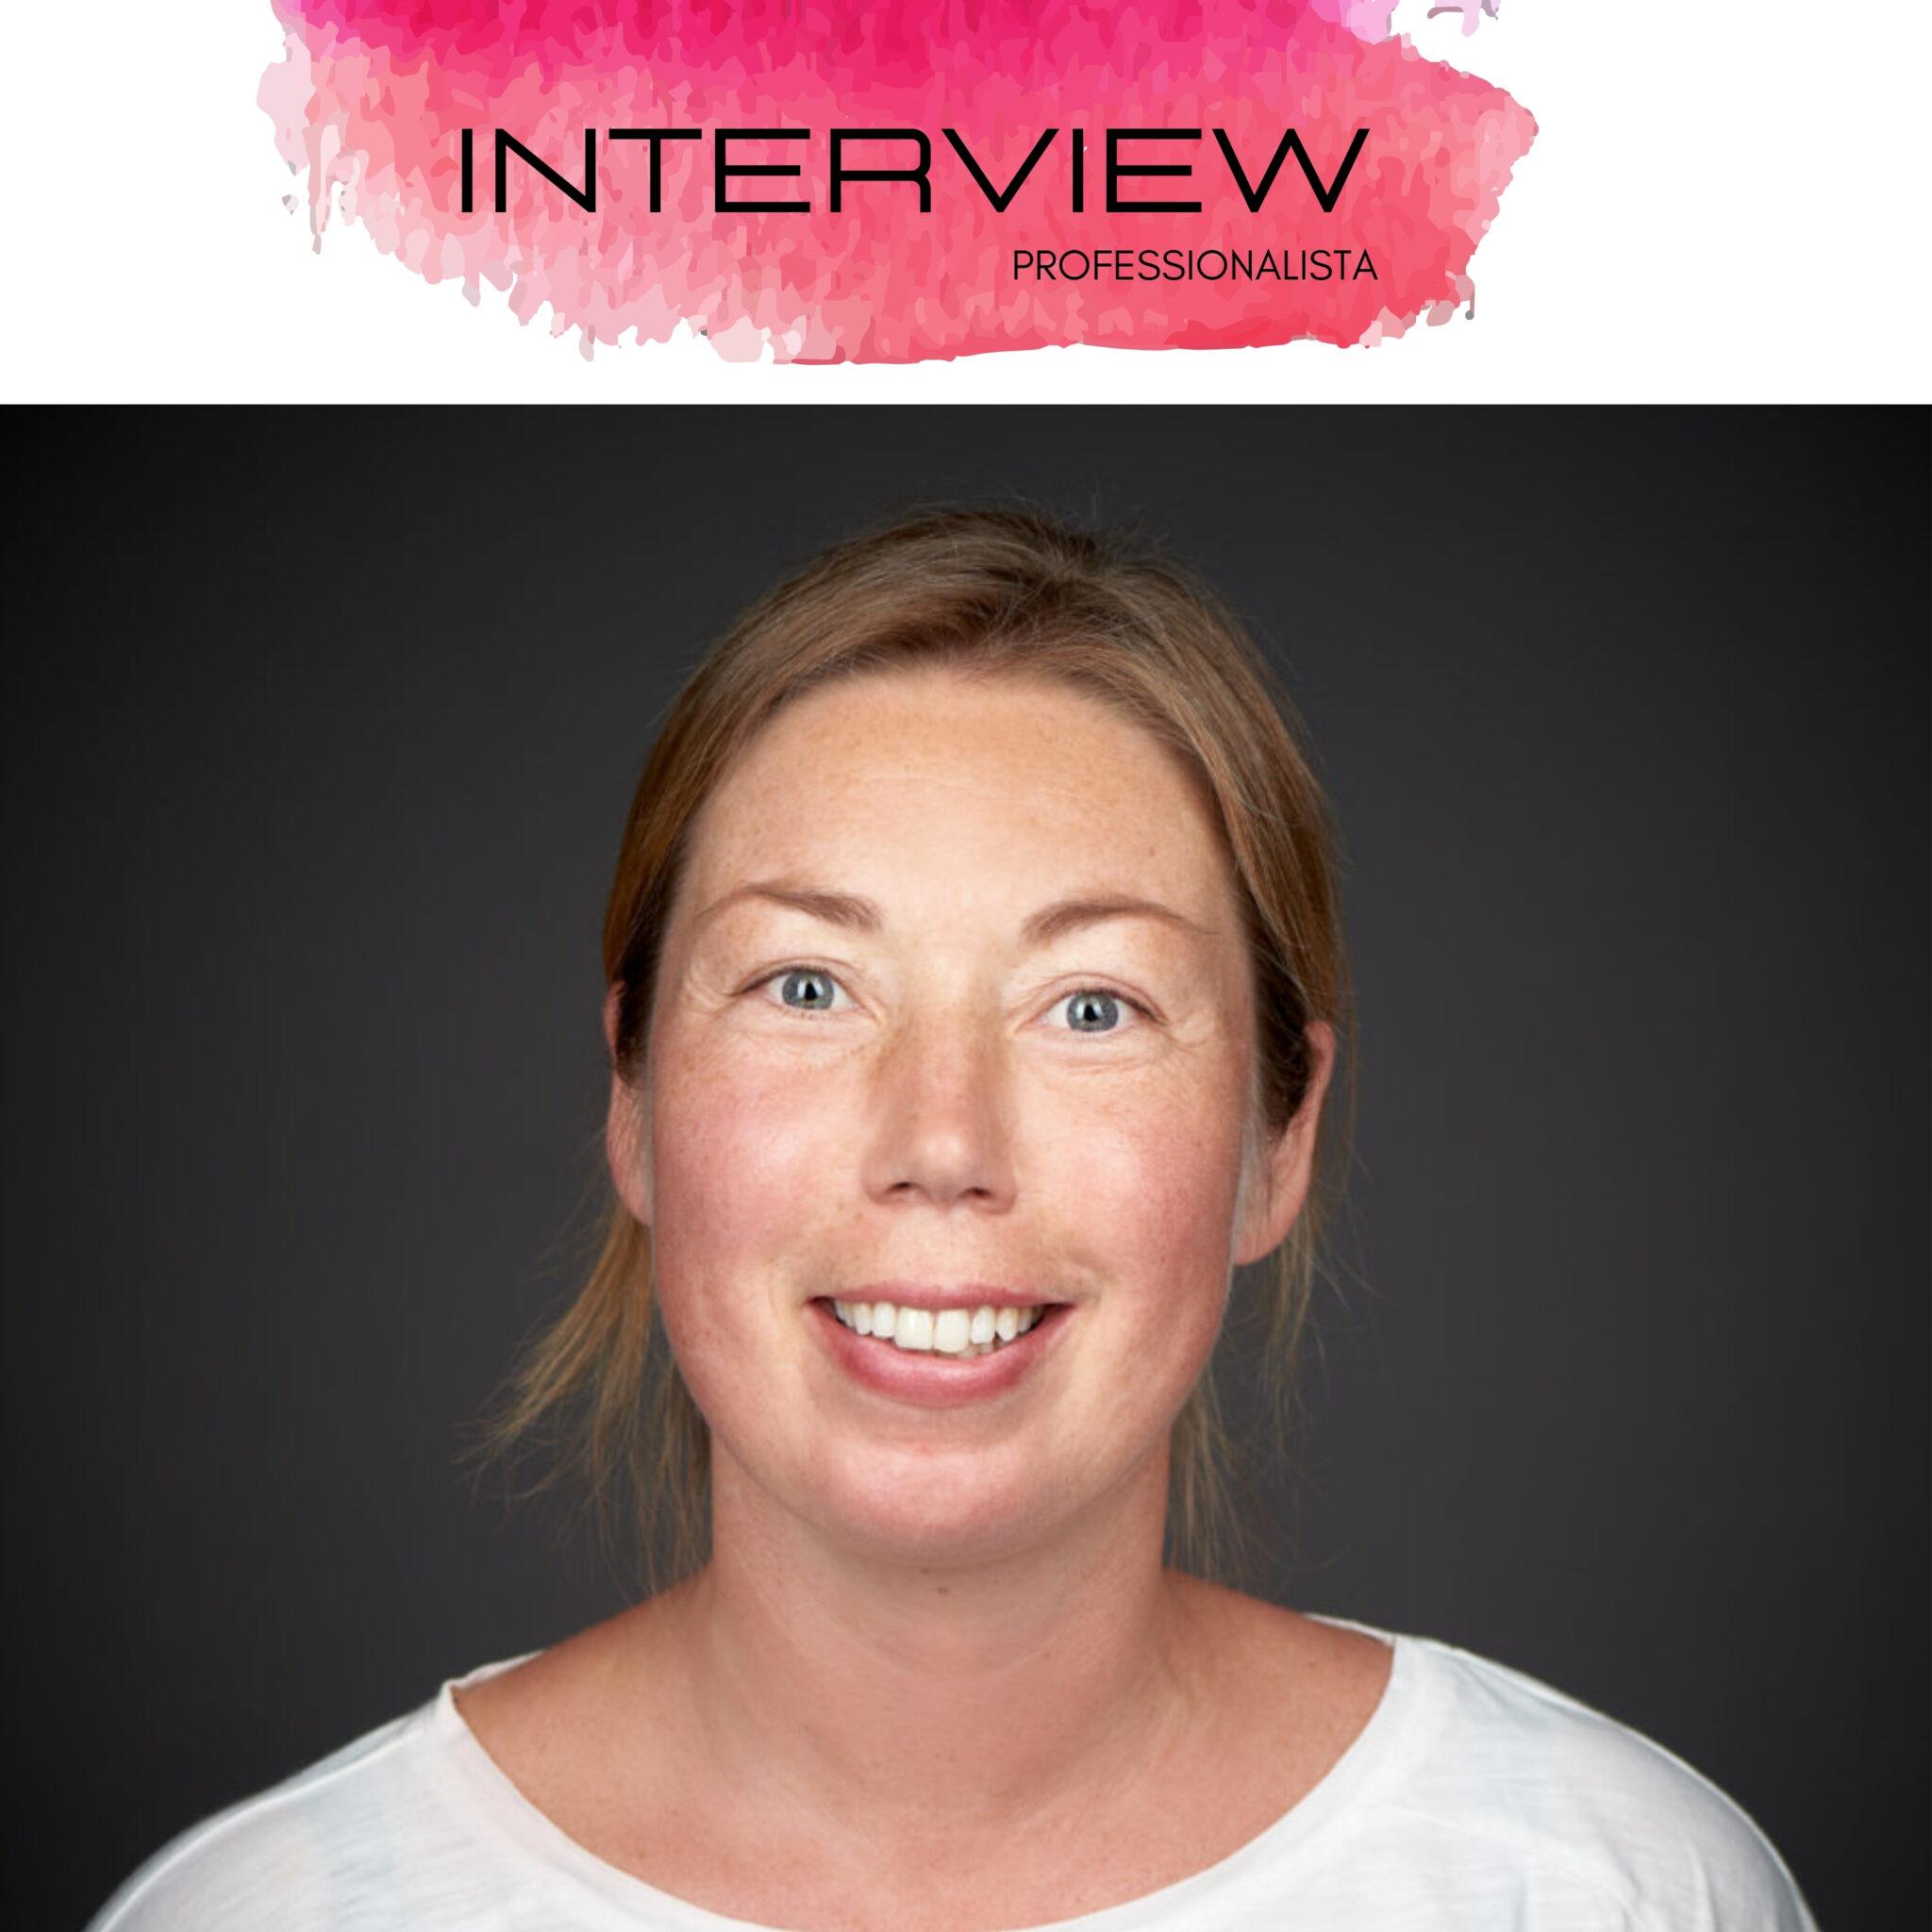 Interview Professionalista Marieke Kalverda